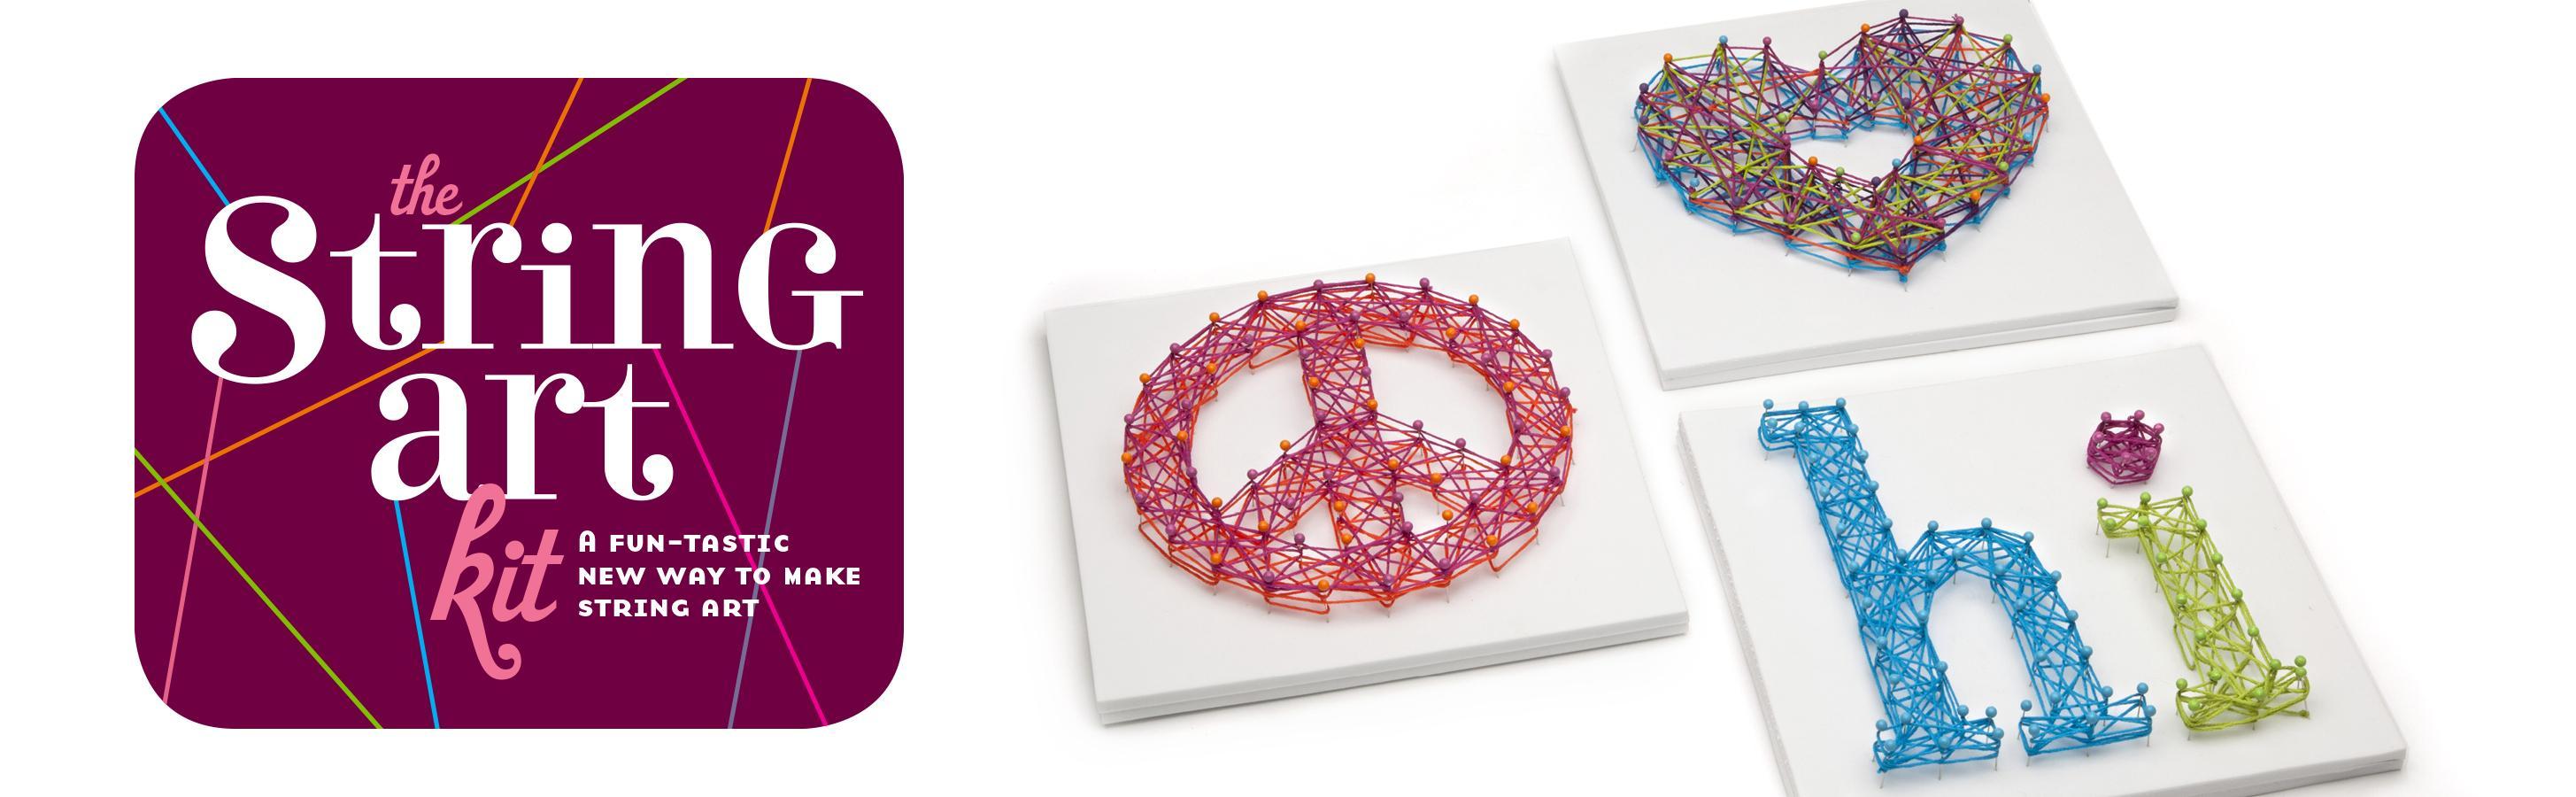 String art craft kit - Craft Tastic String Art Kit A Funtastic New Way To Make String Art